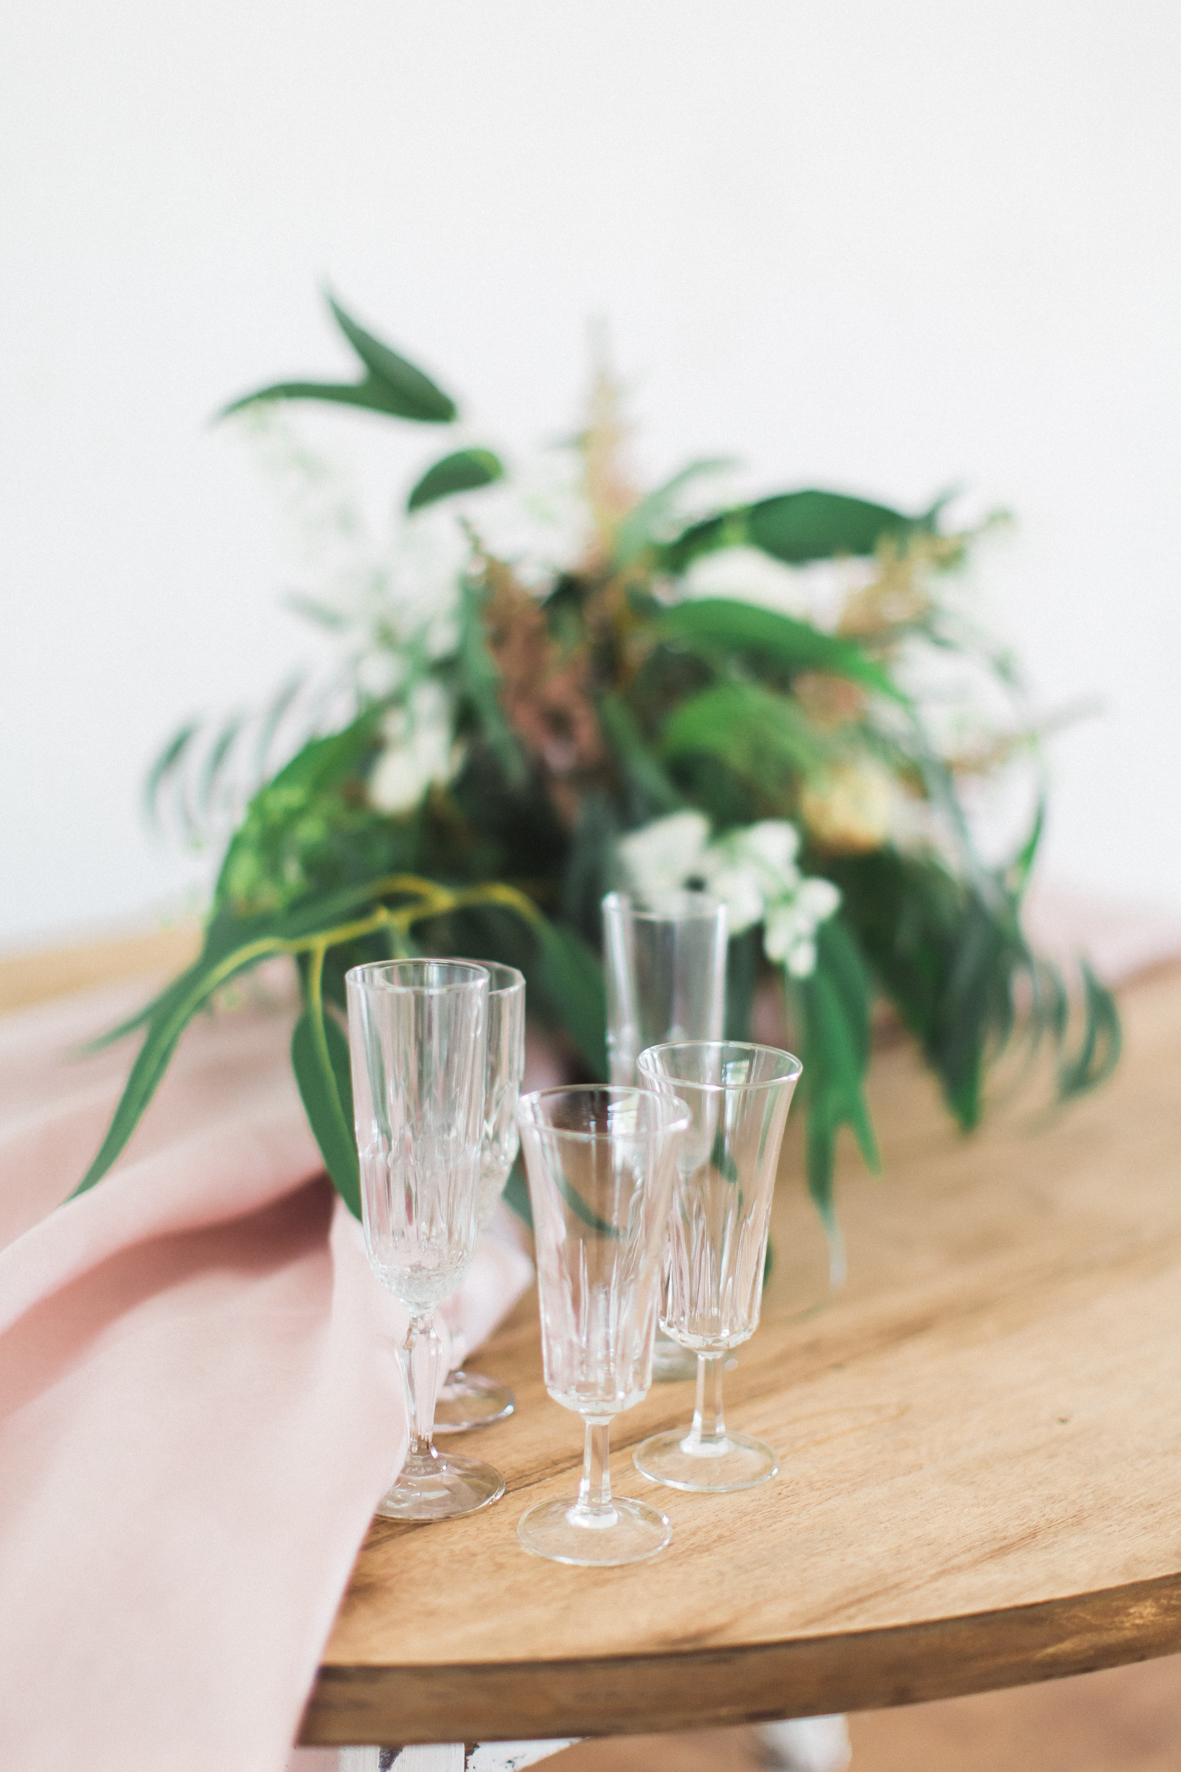 OBDD-jerometarakci-photographe-mariage-paris-angers-nantes-111